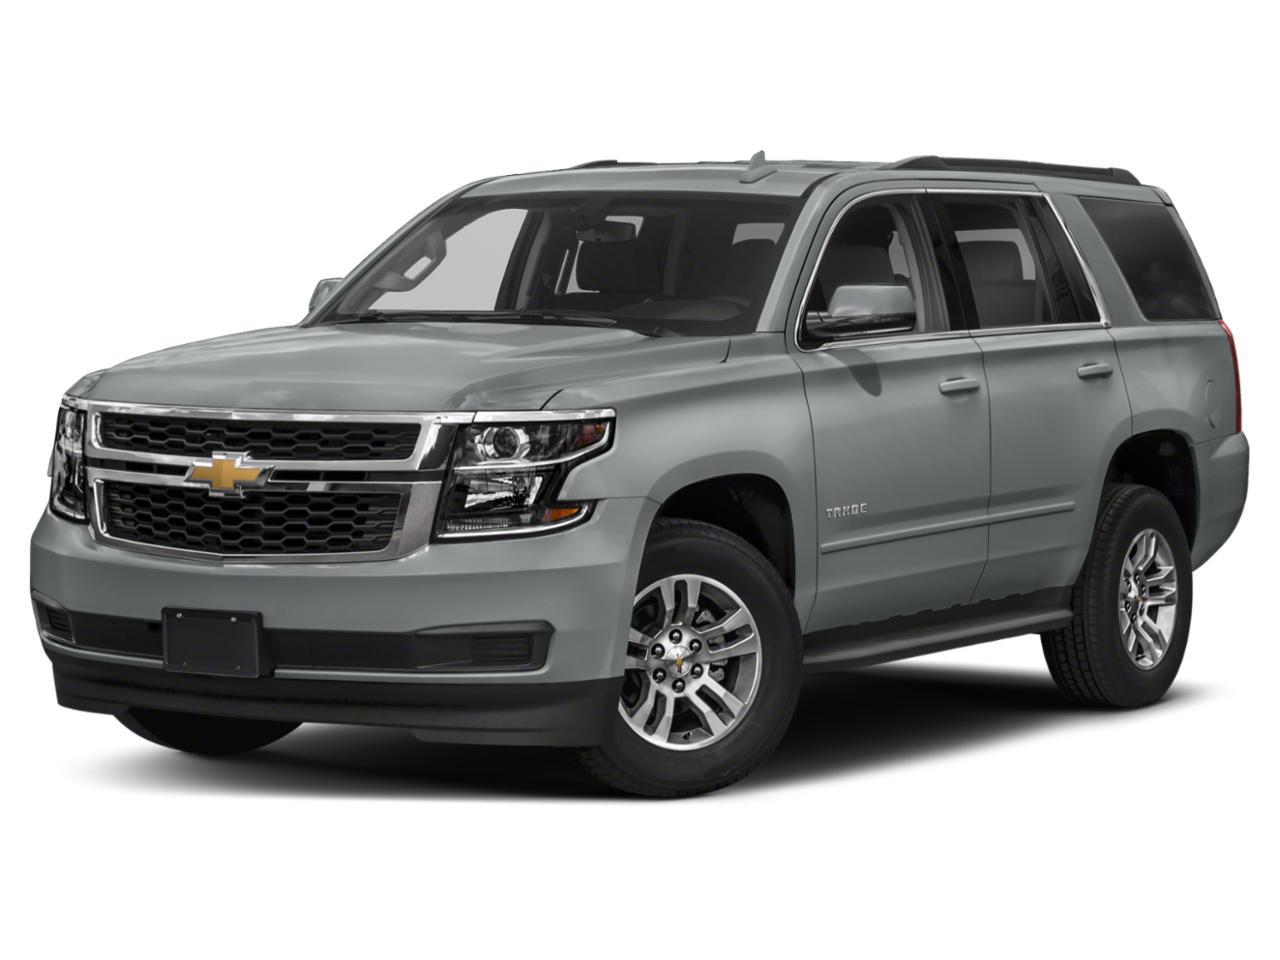 2019 Chevrolet Tahoe Vehicle Photo in Baton Rouge, LA 70806